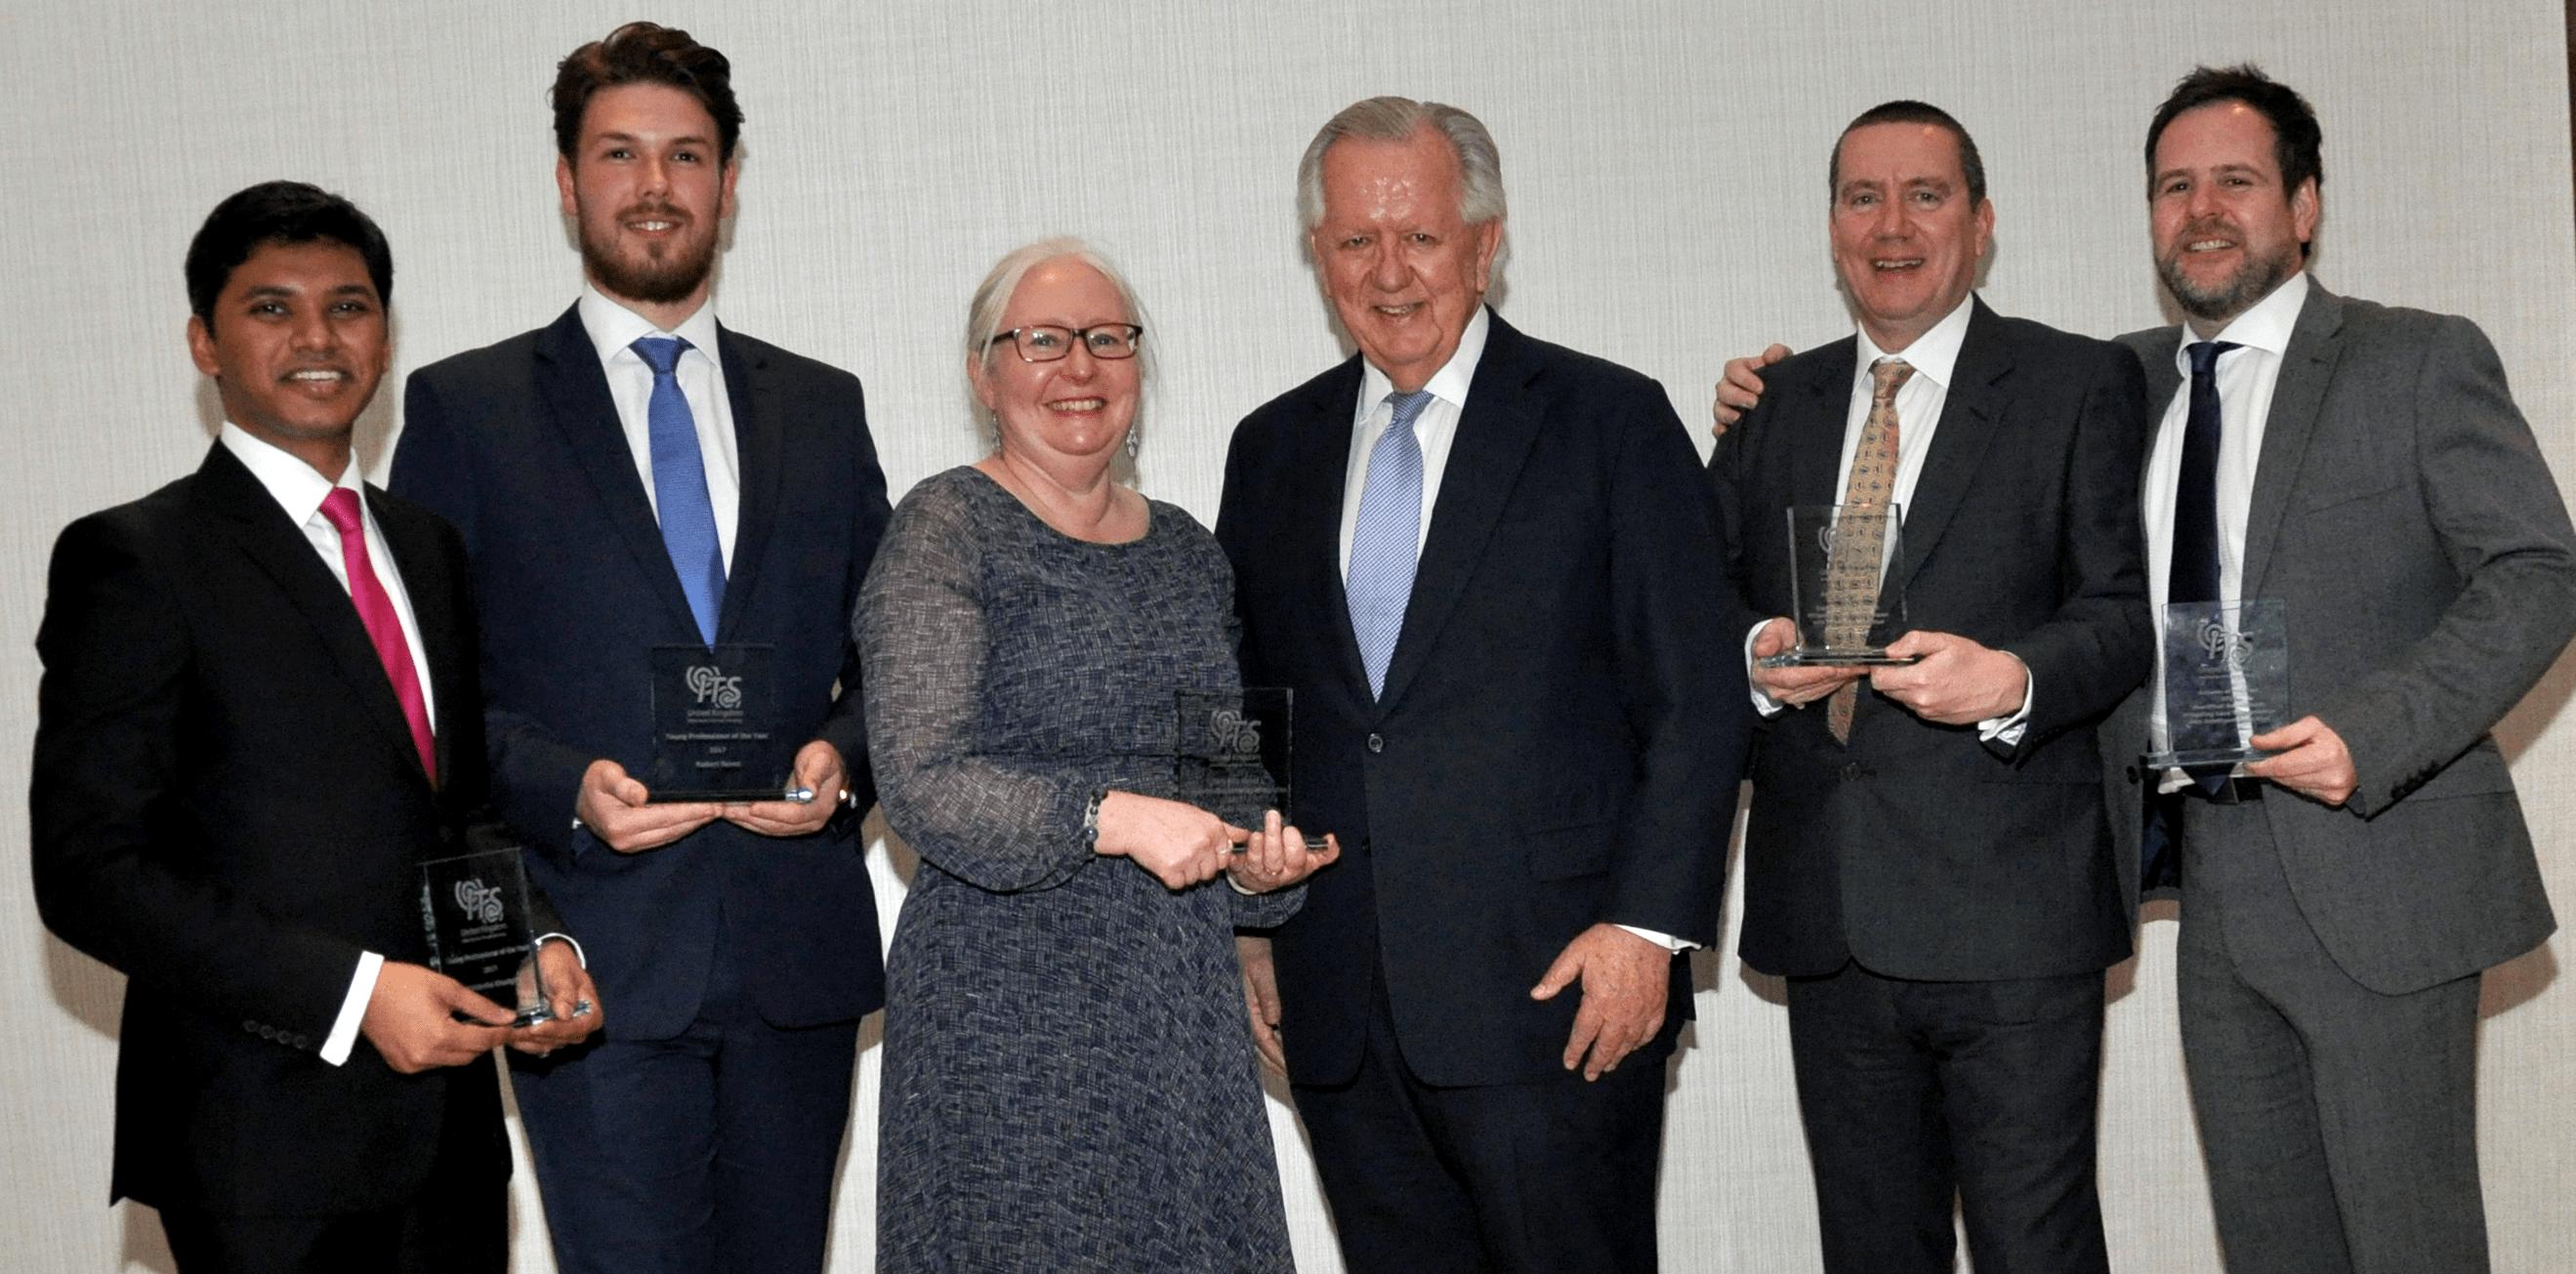 ITS United Kingdom announces 2017 award winners